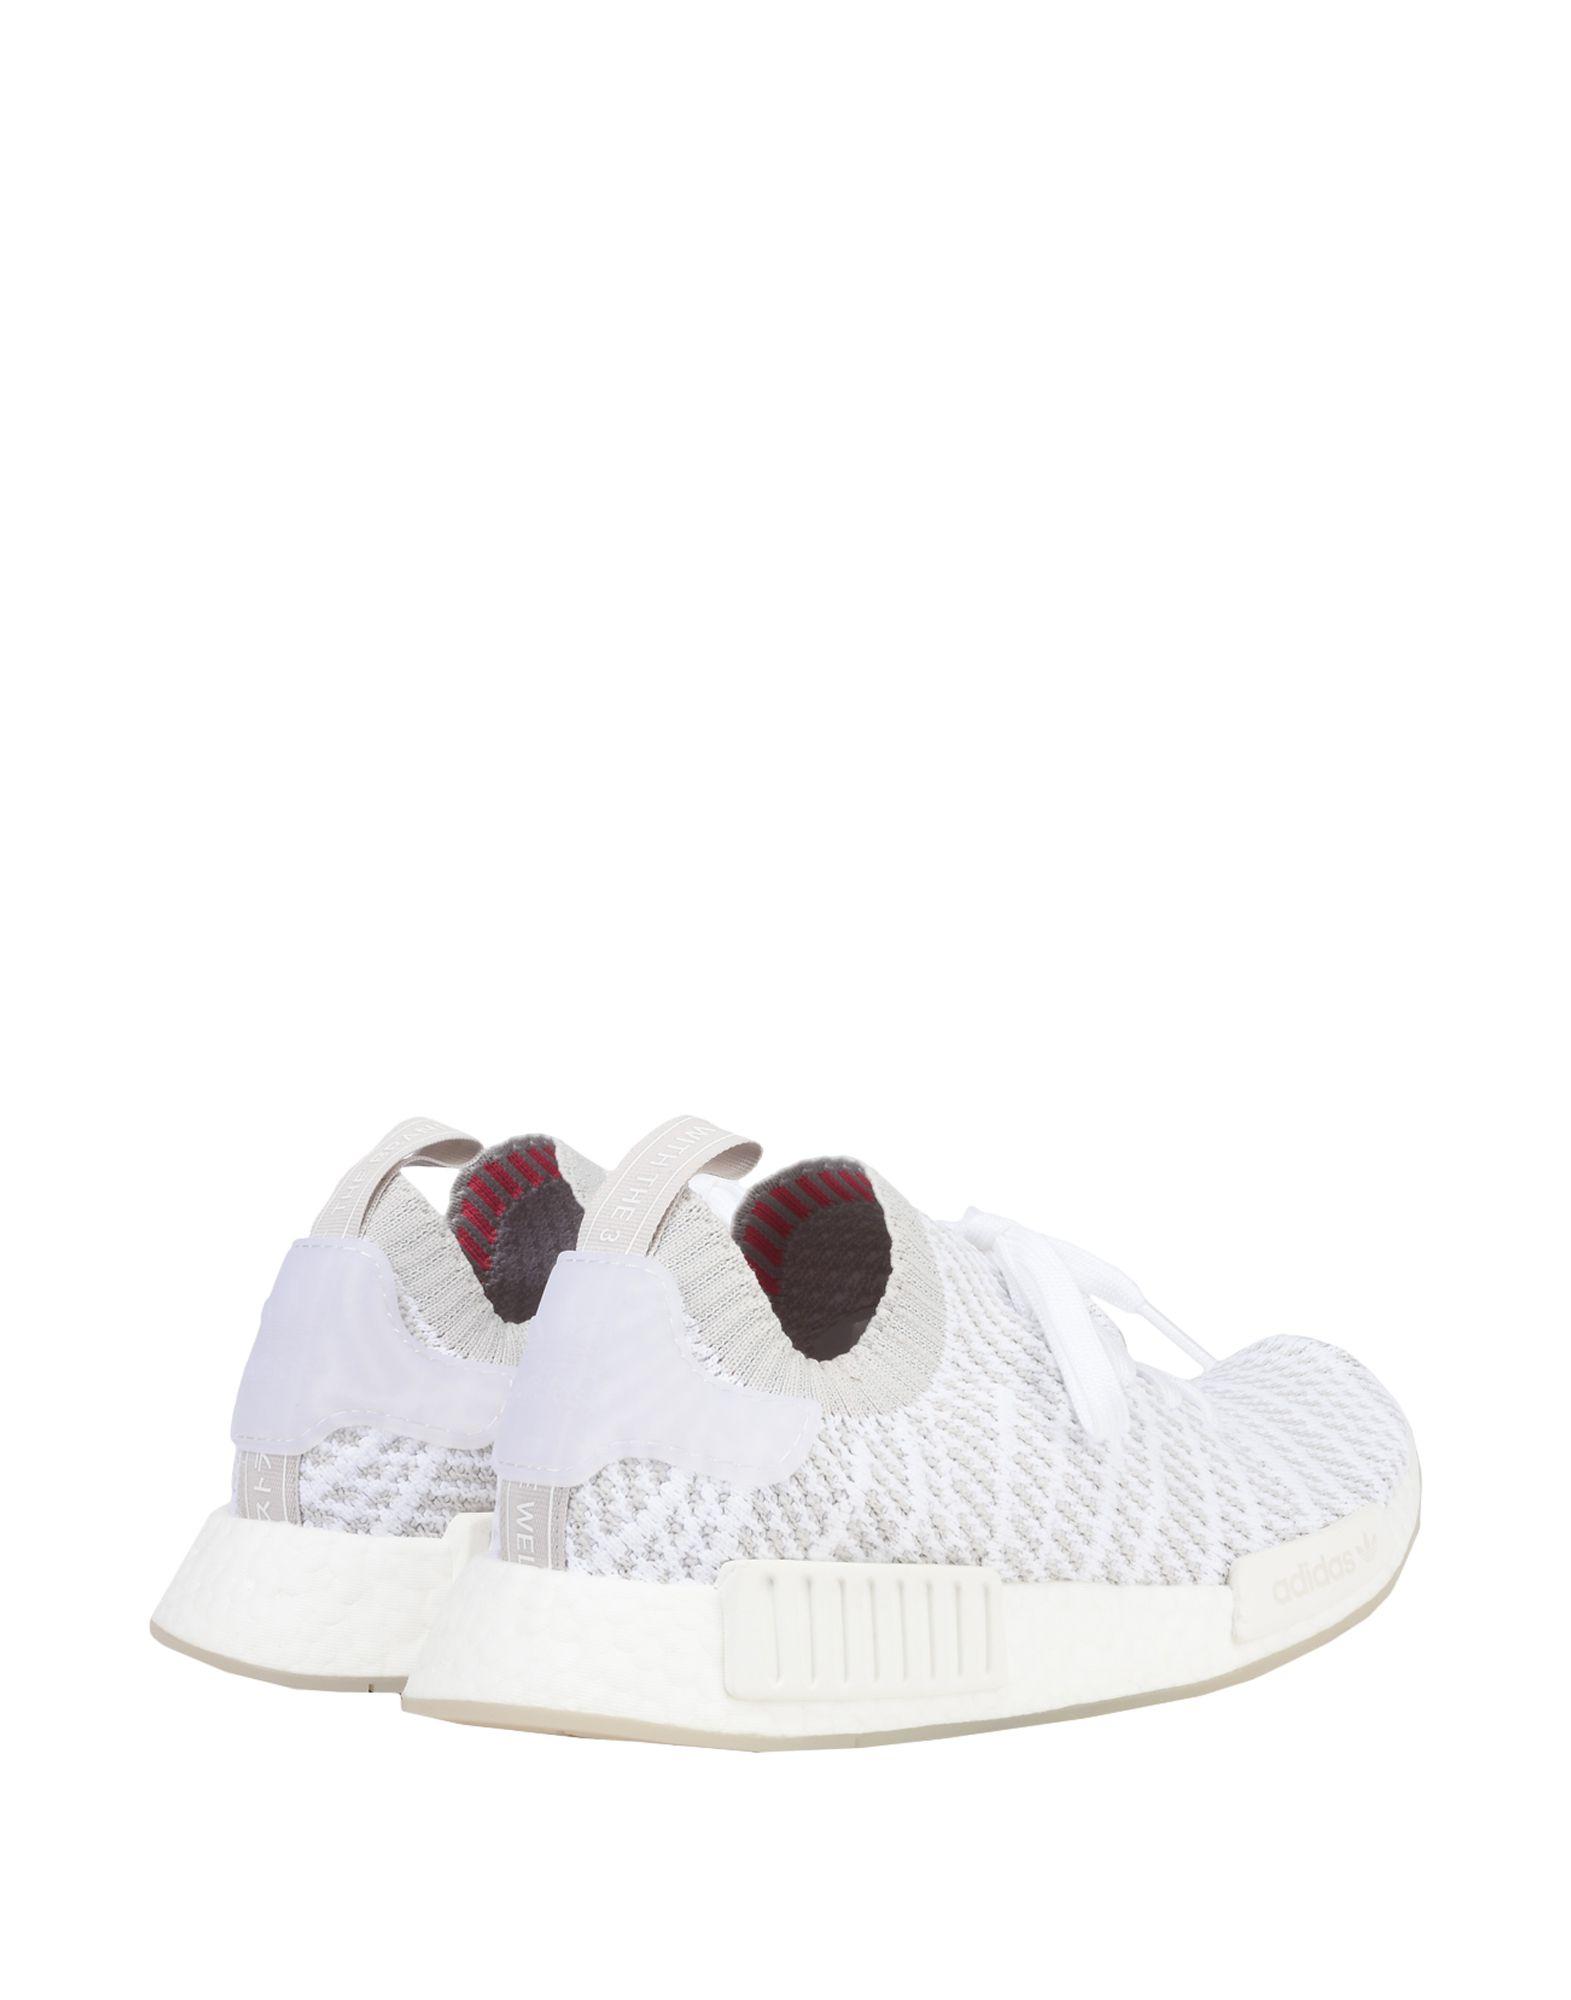 Sneakers Stlt Adidas Originals Nmd_R1 Stlt Sneakers Pk - Donna - 11482488KI d6039e